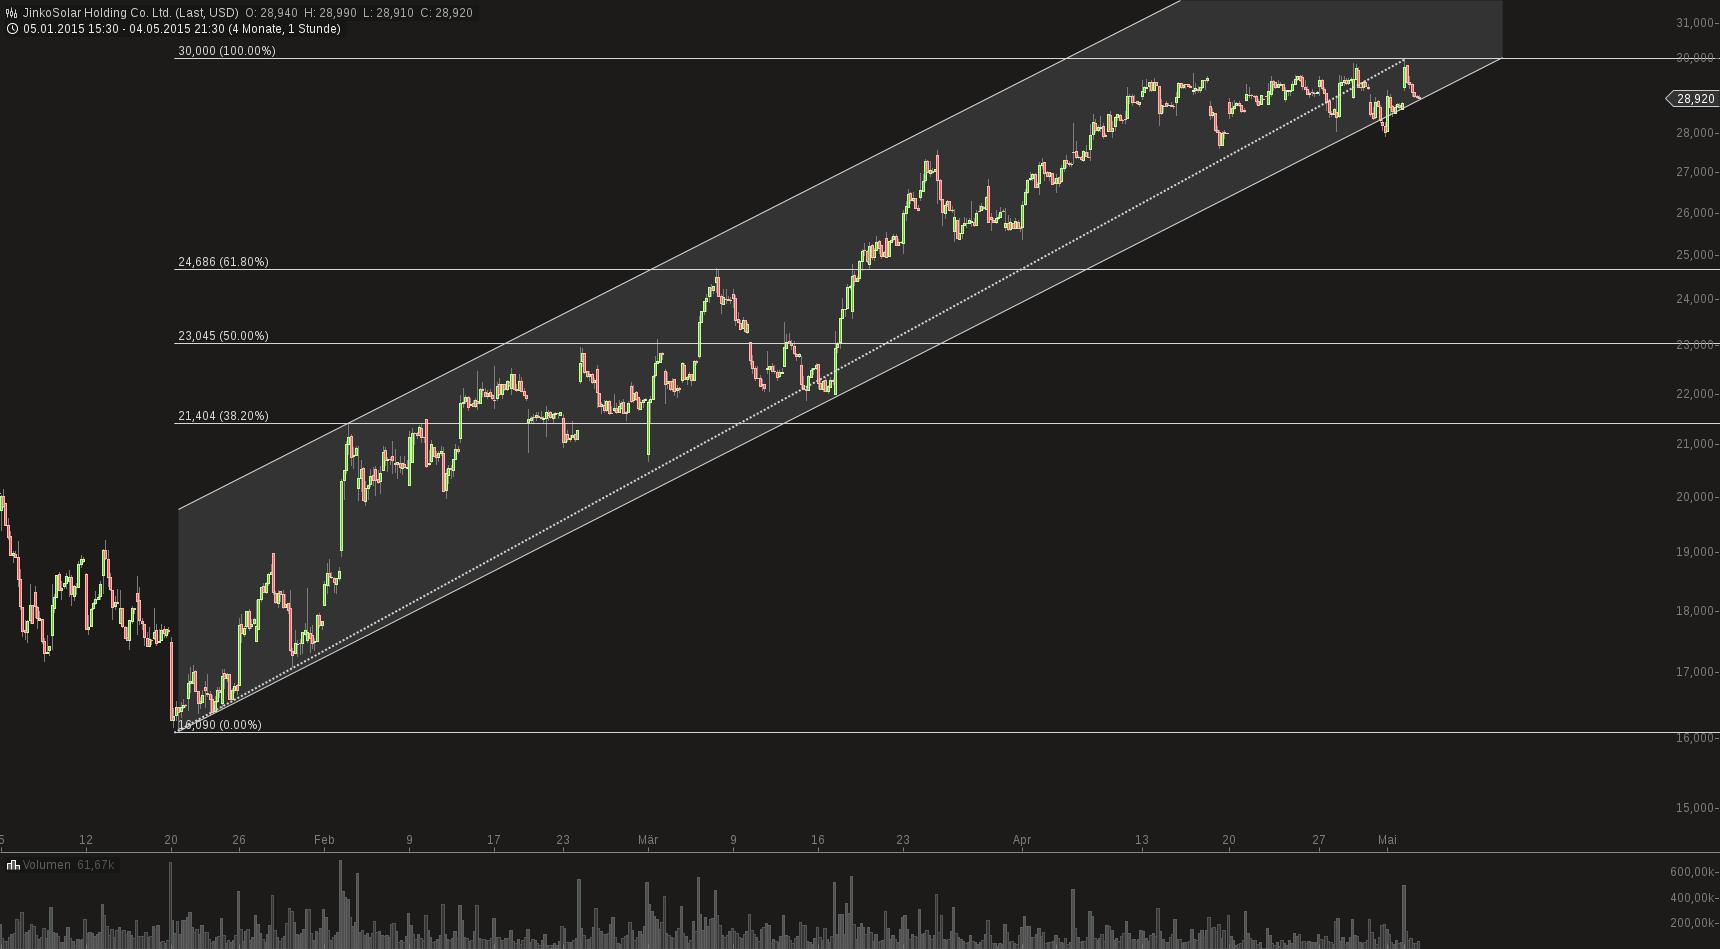 chart-05052015-0914-jinkosolar_holding_co_ltd.png